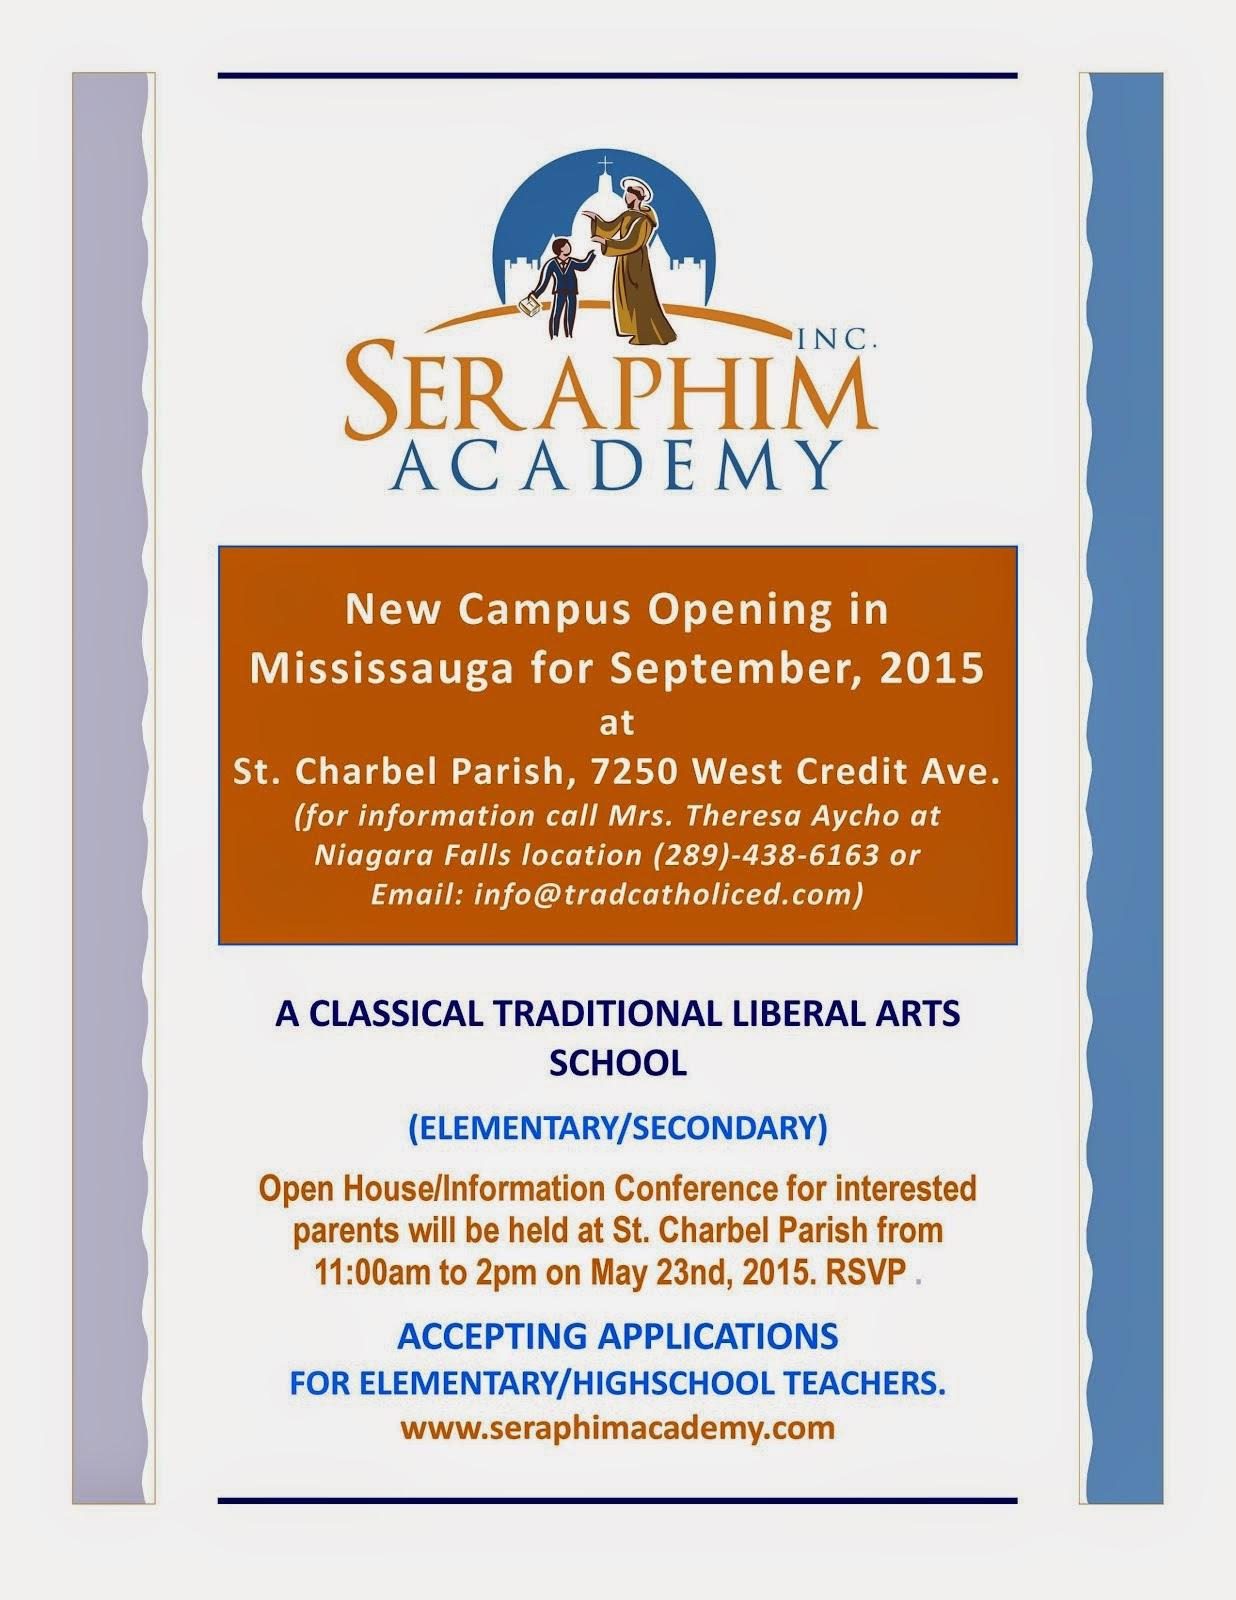 Seraphim Academy